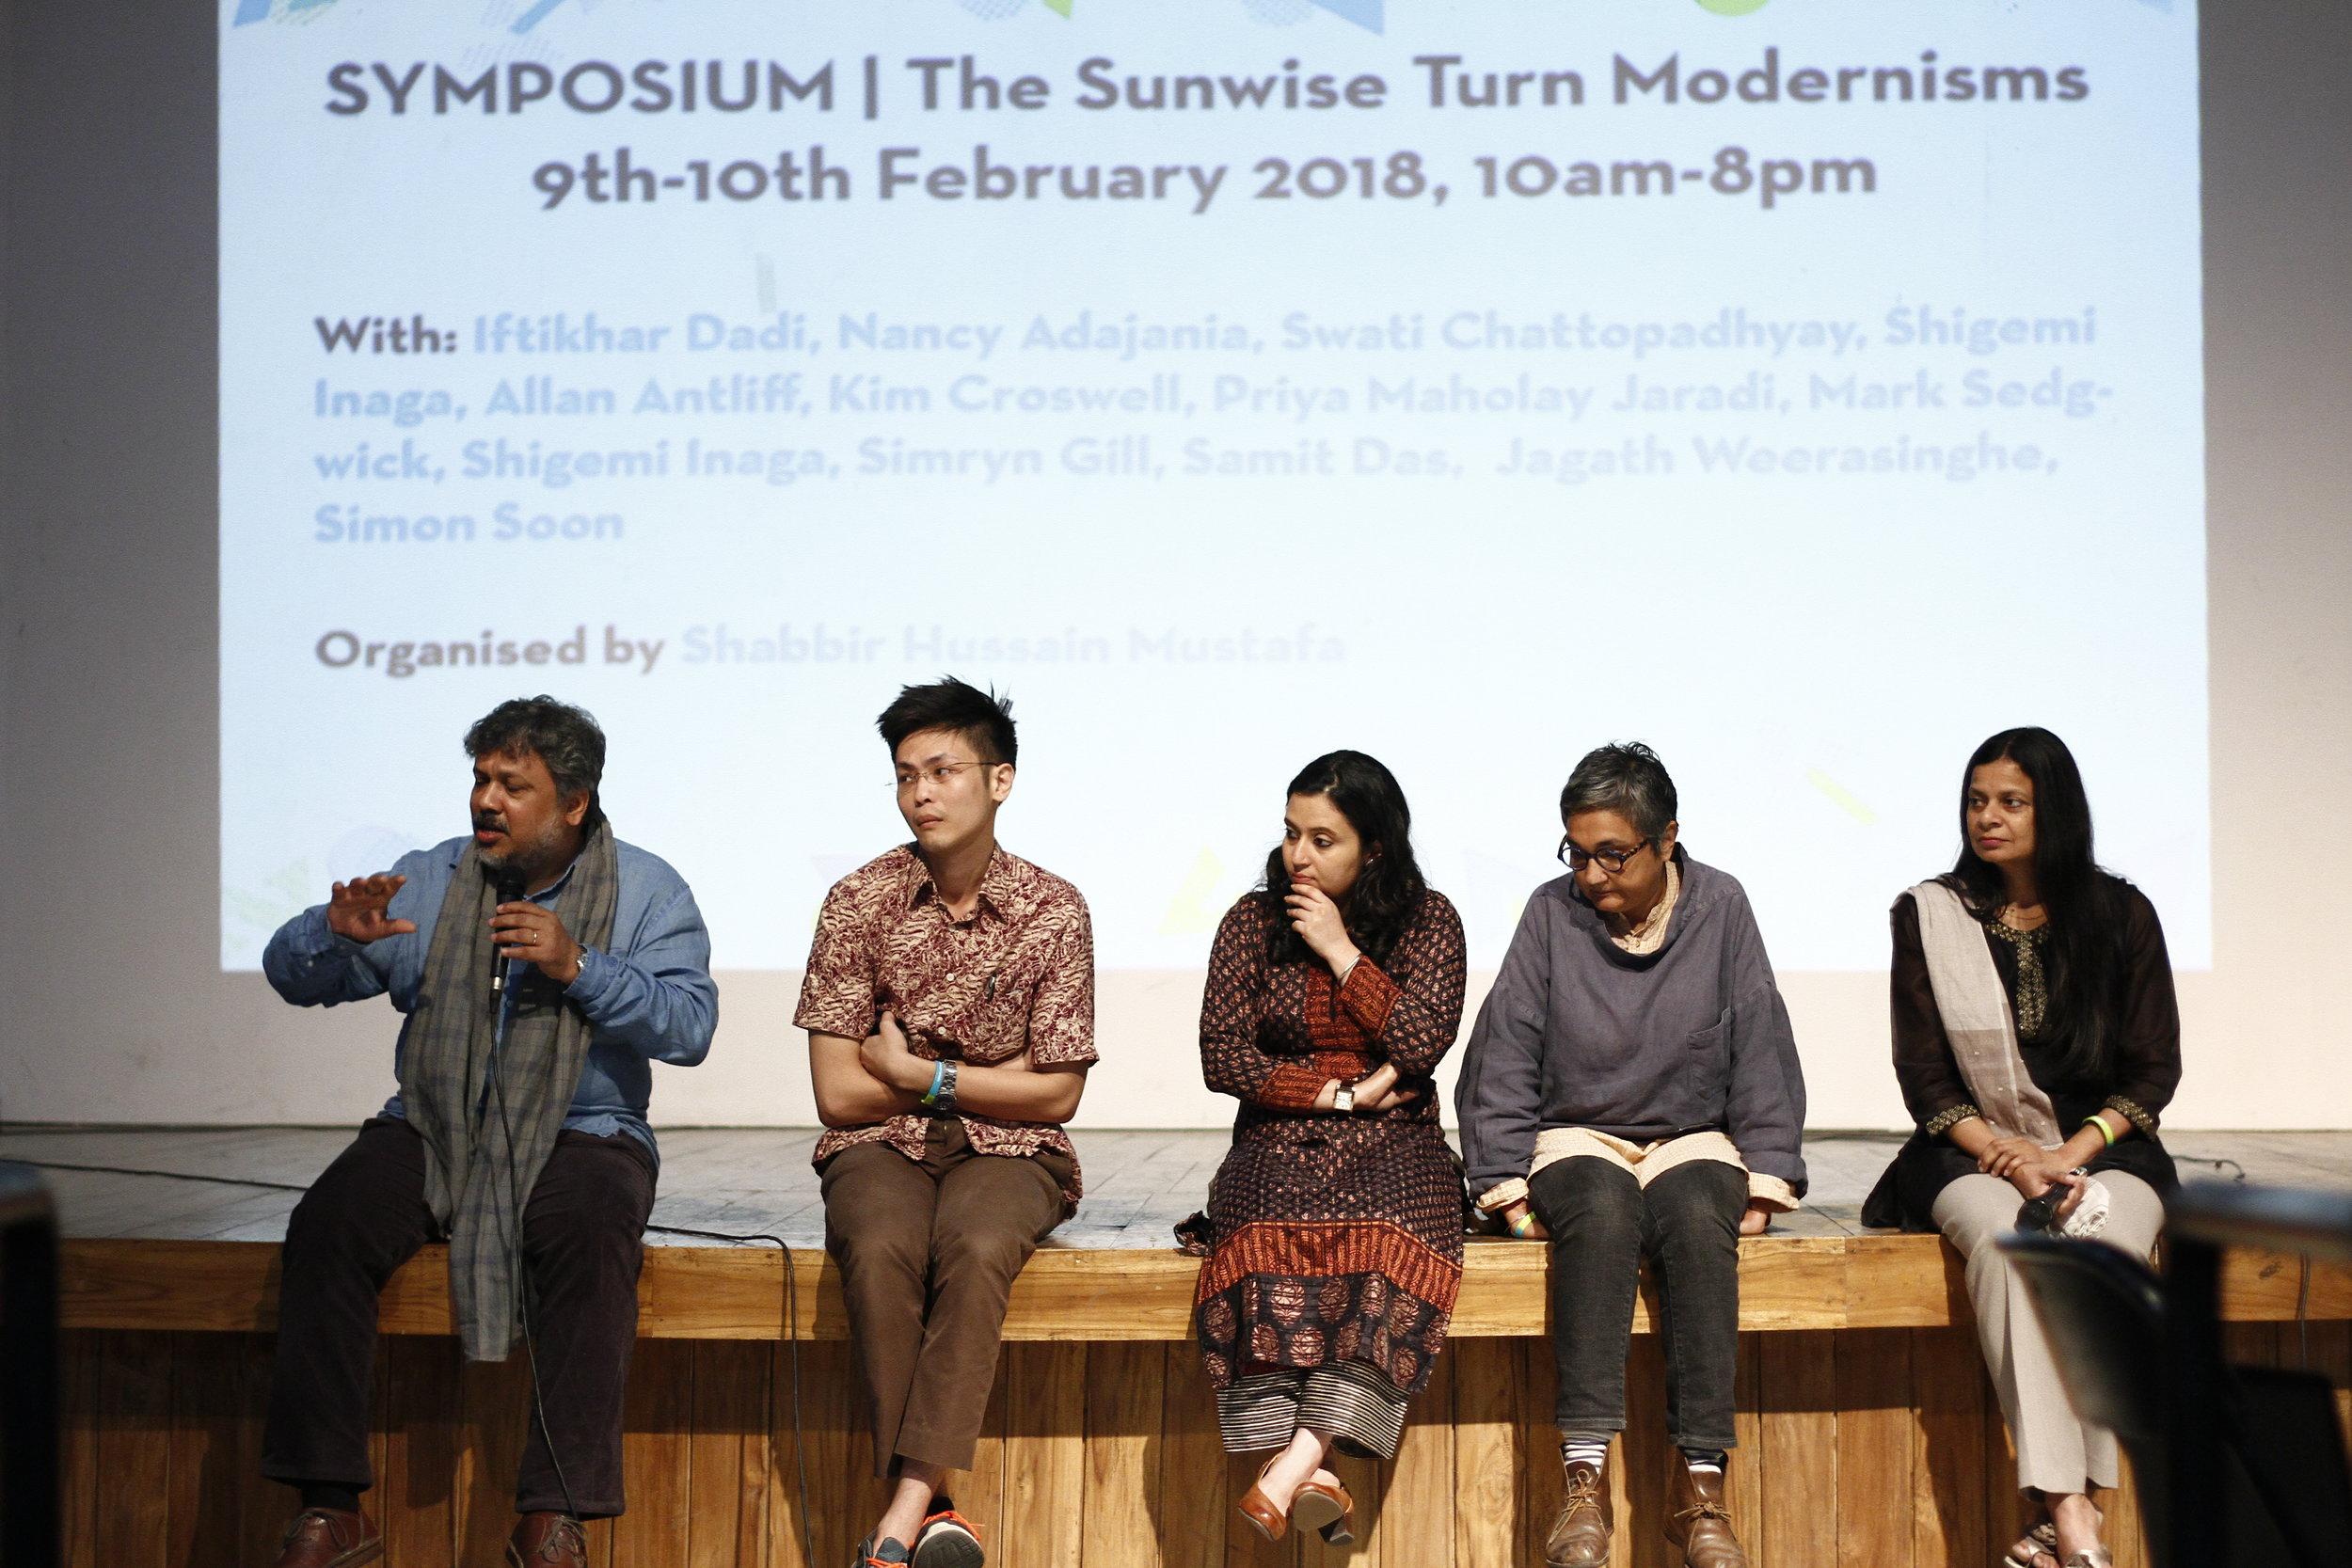 Panel Discussion between Samit Das, Simon Soon, Priya Maholay Jaradi, moderated by Swati Chattopadhyay